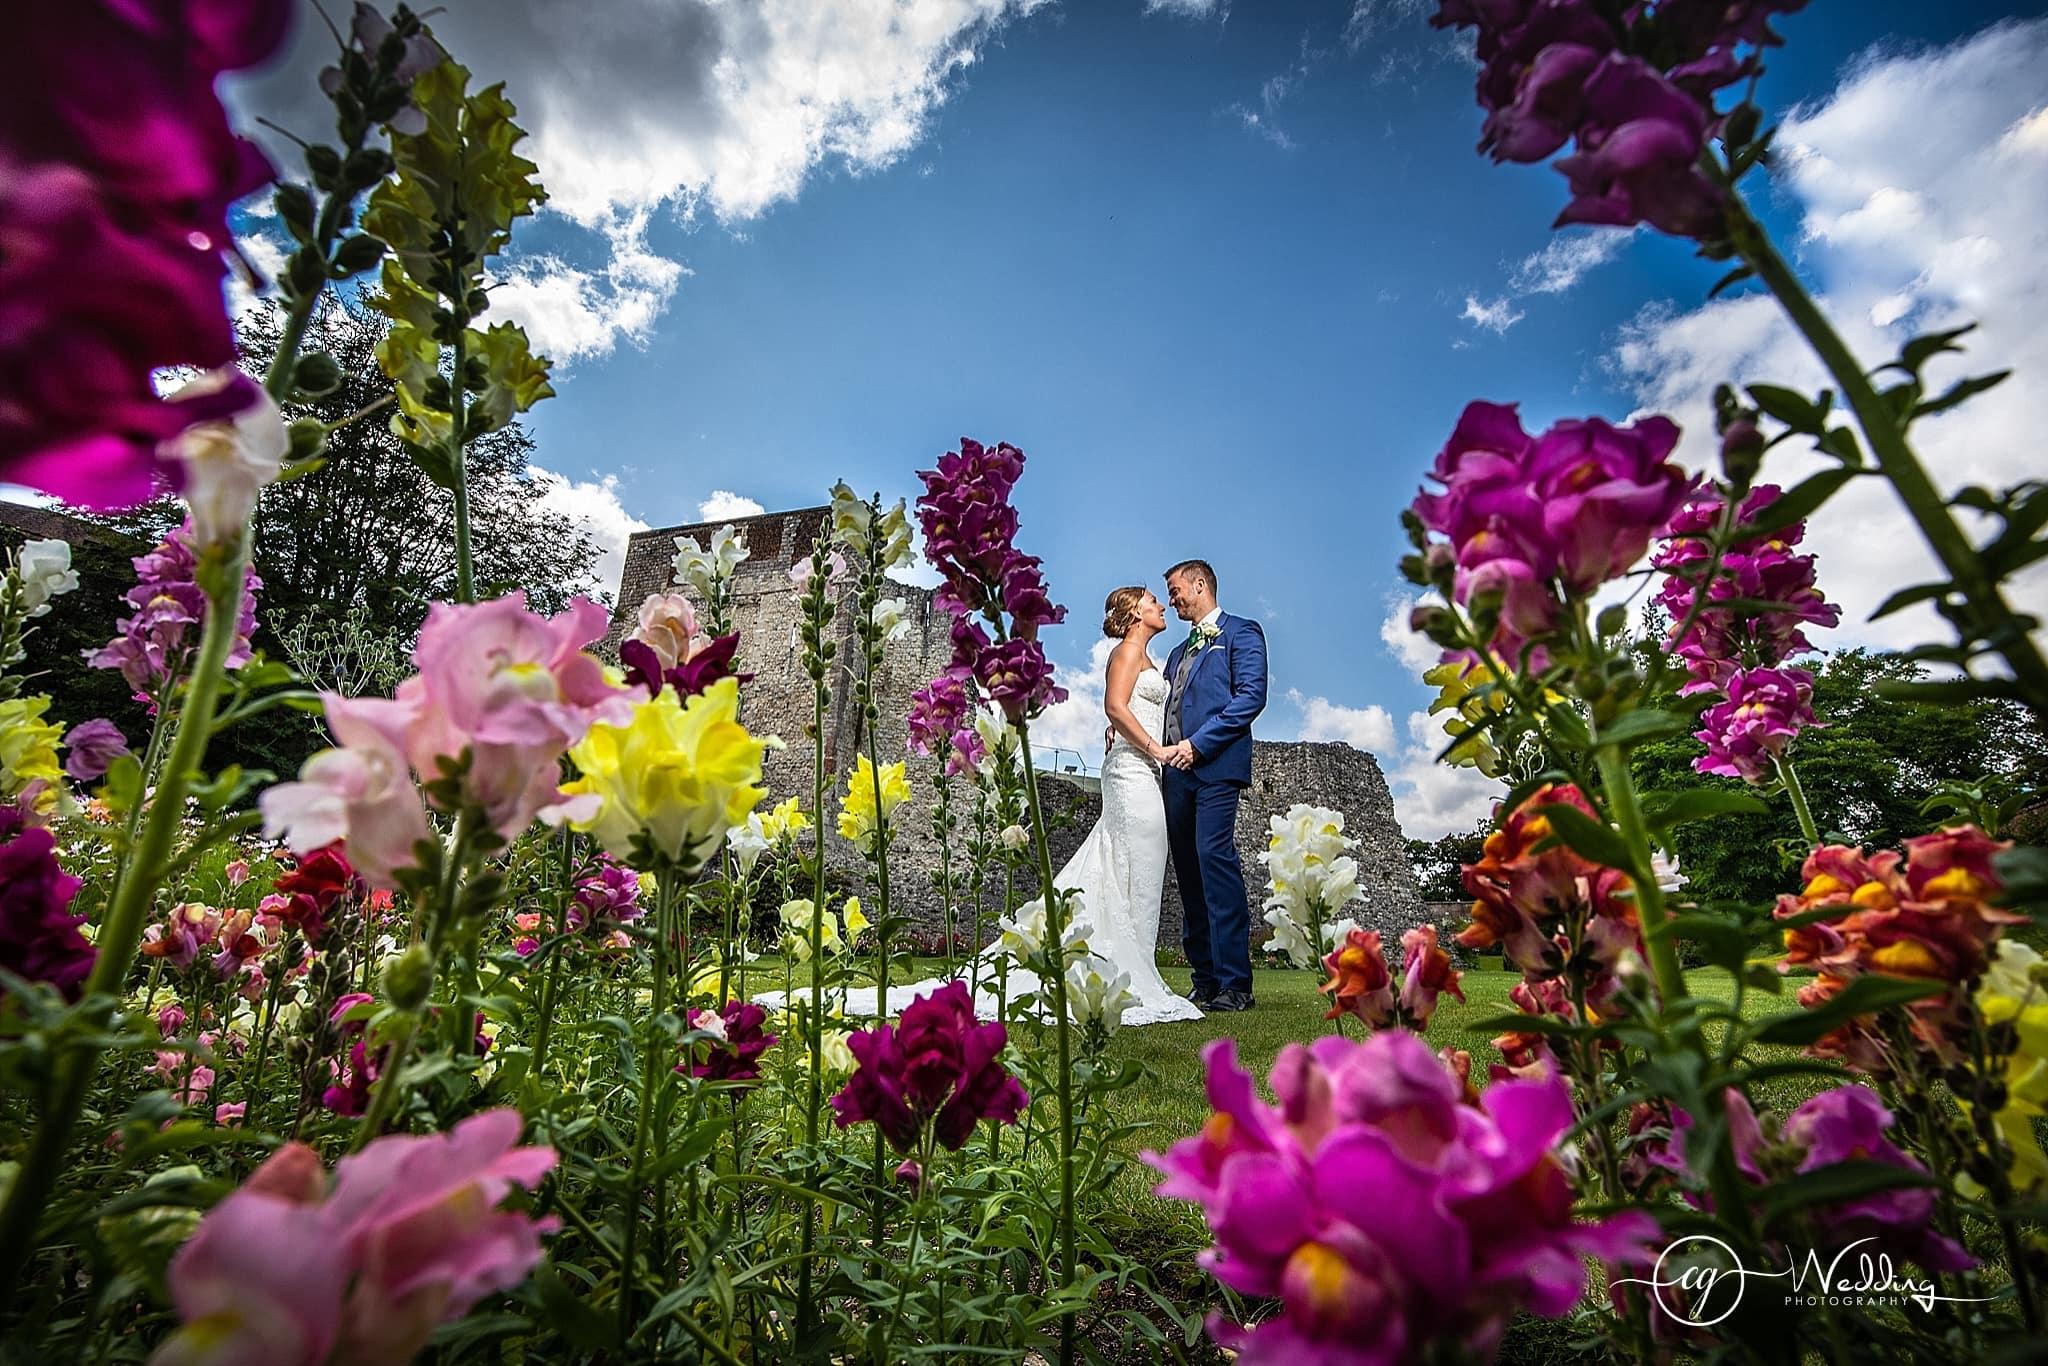 Farnham Castle Wedding Photo by WWW.CGPHOTOTGRAPHY.CO.UK